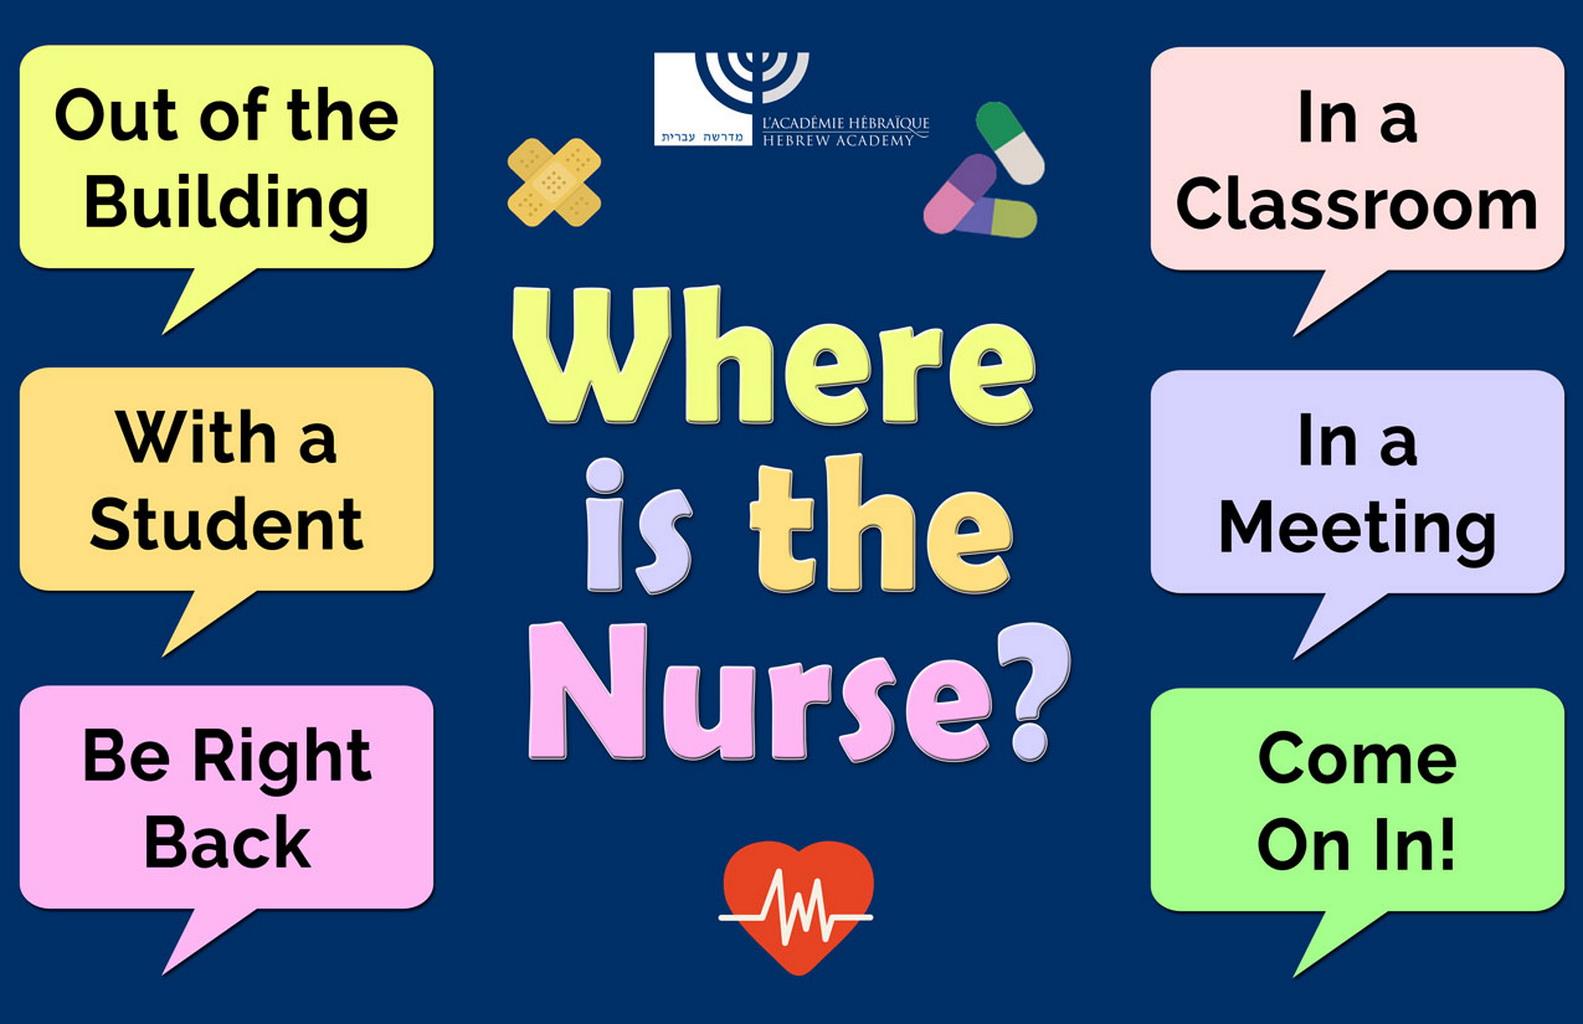 Where Is the Nurse